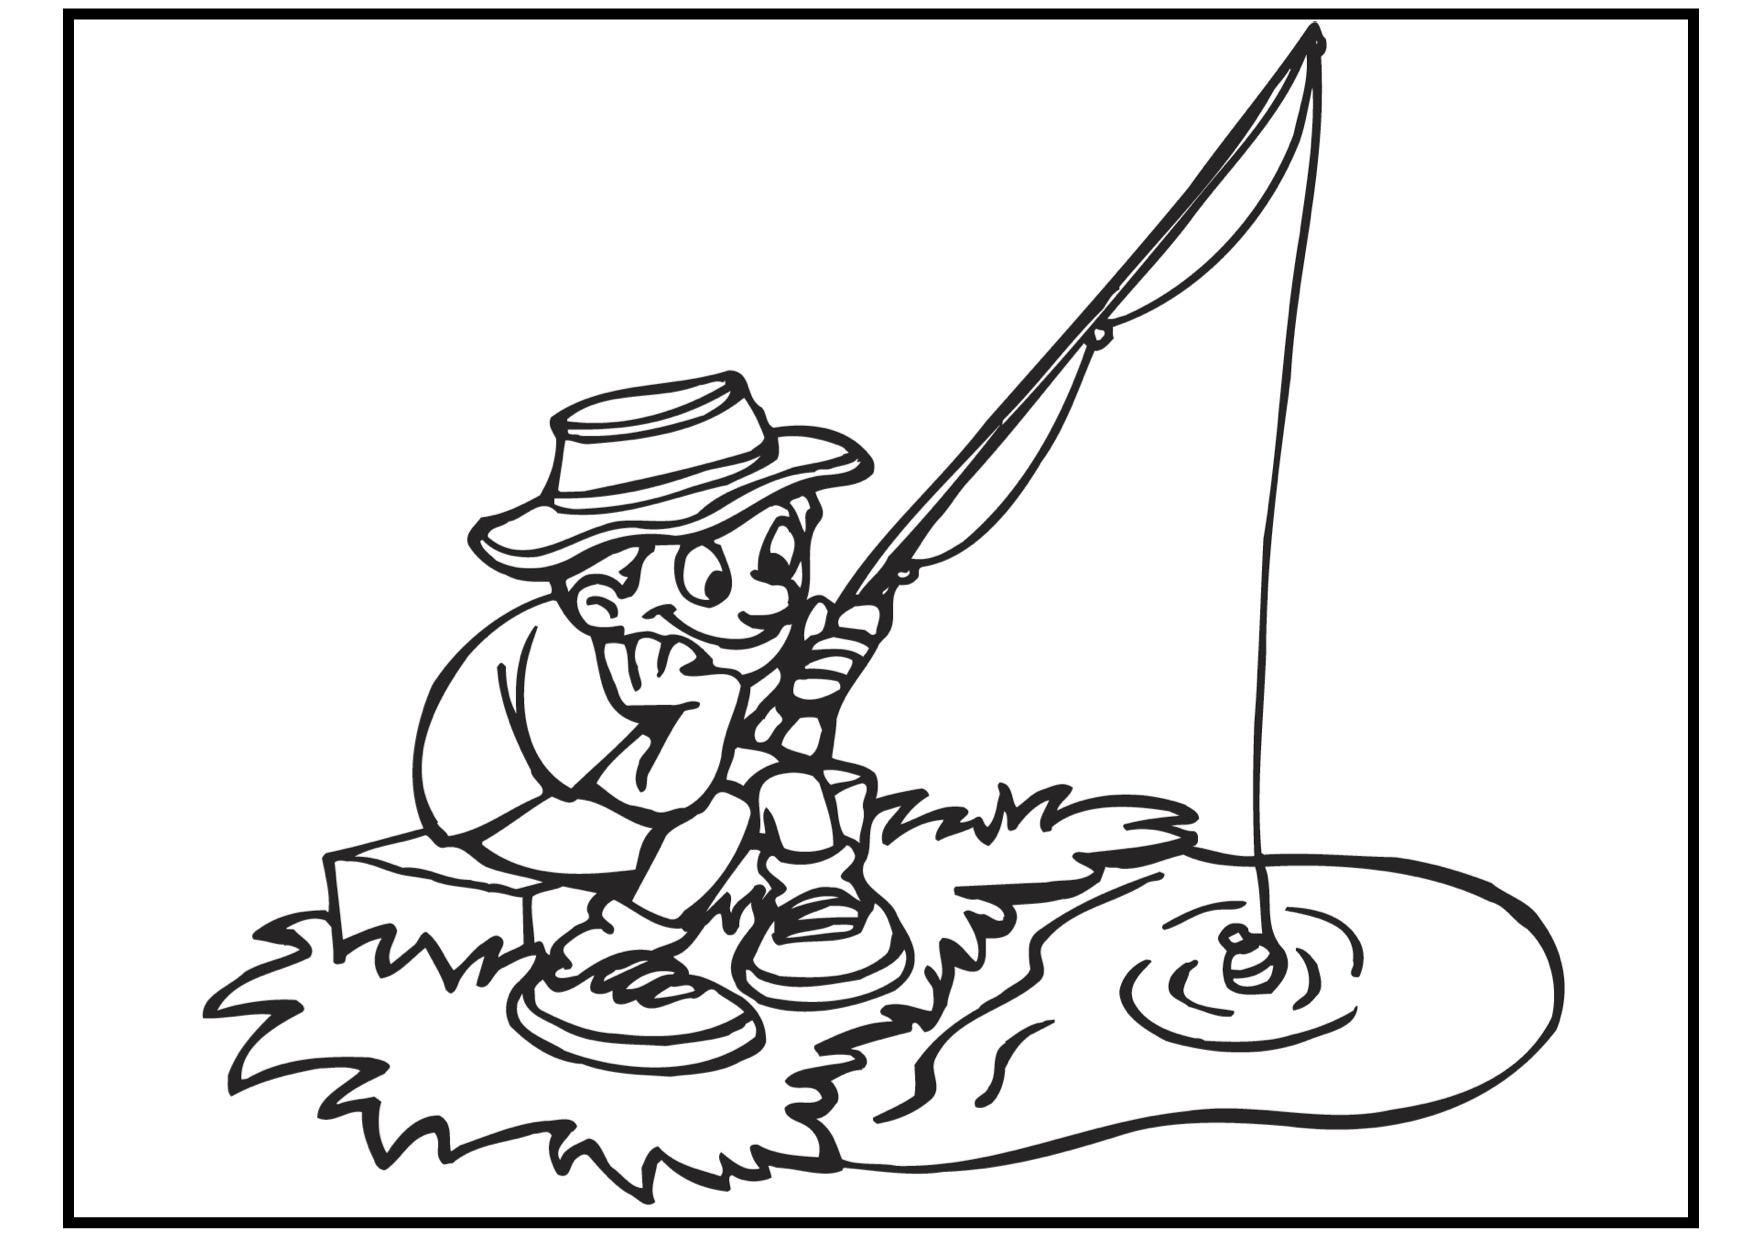 1754x1239 Fishing Coloring Pages Page Ribsvigyapan Bass Fishing Coloring